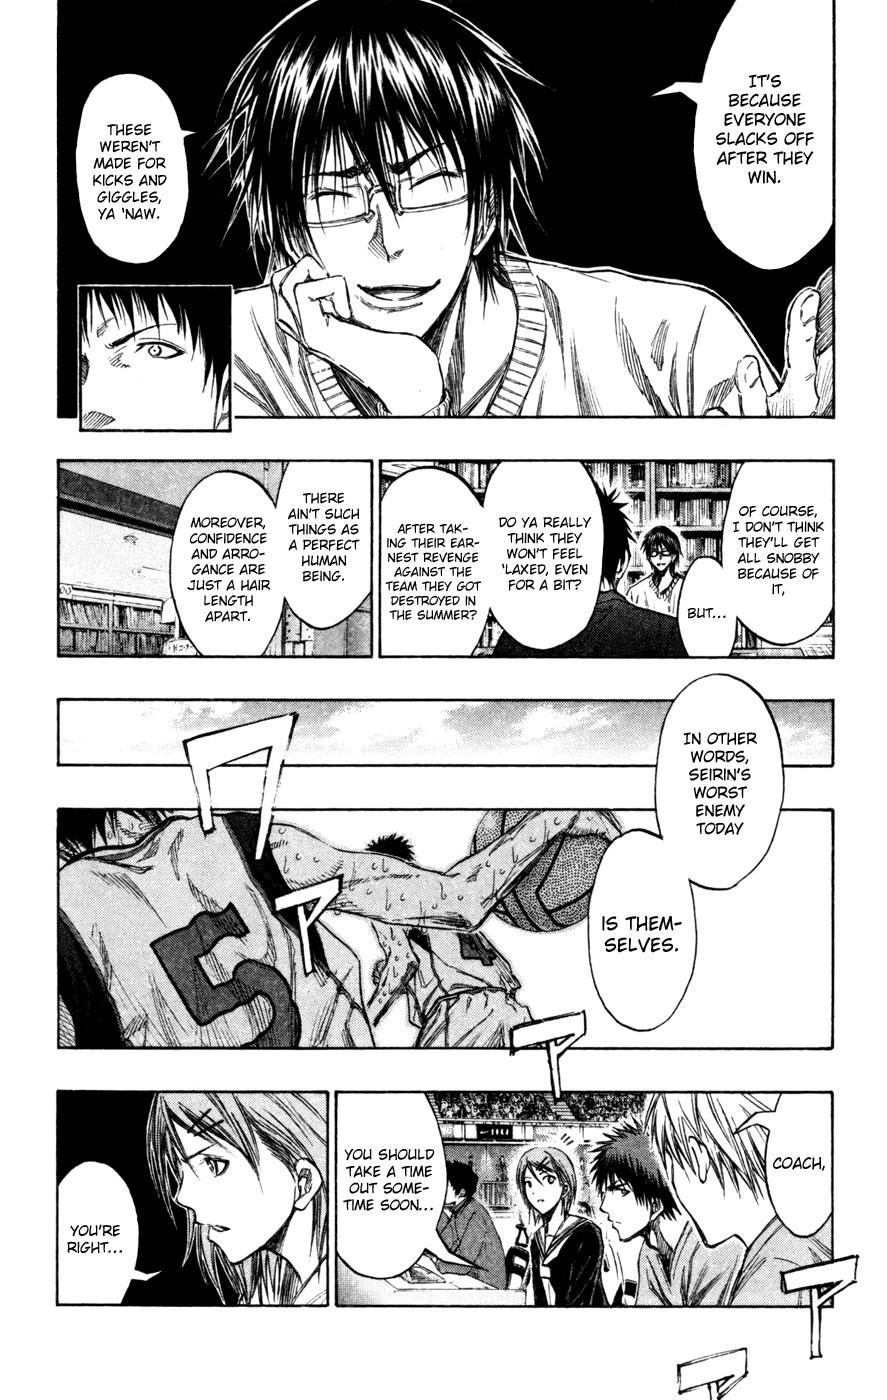 Kuroko no Basket Manga Chapter 143 - Image 08